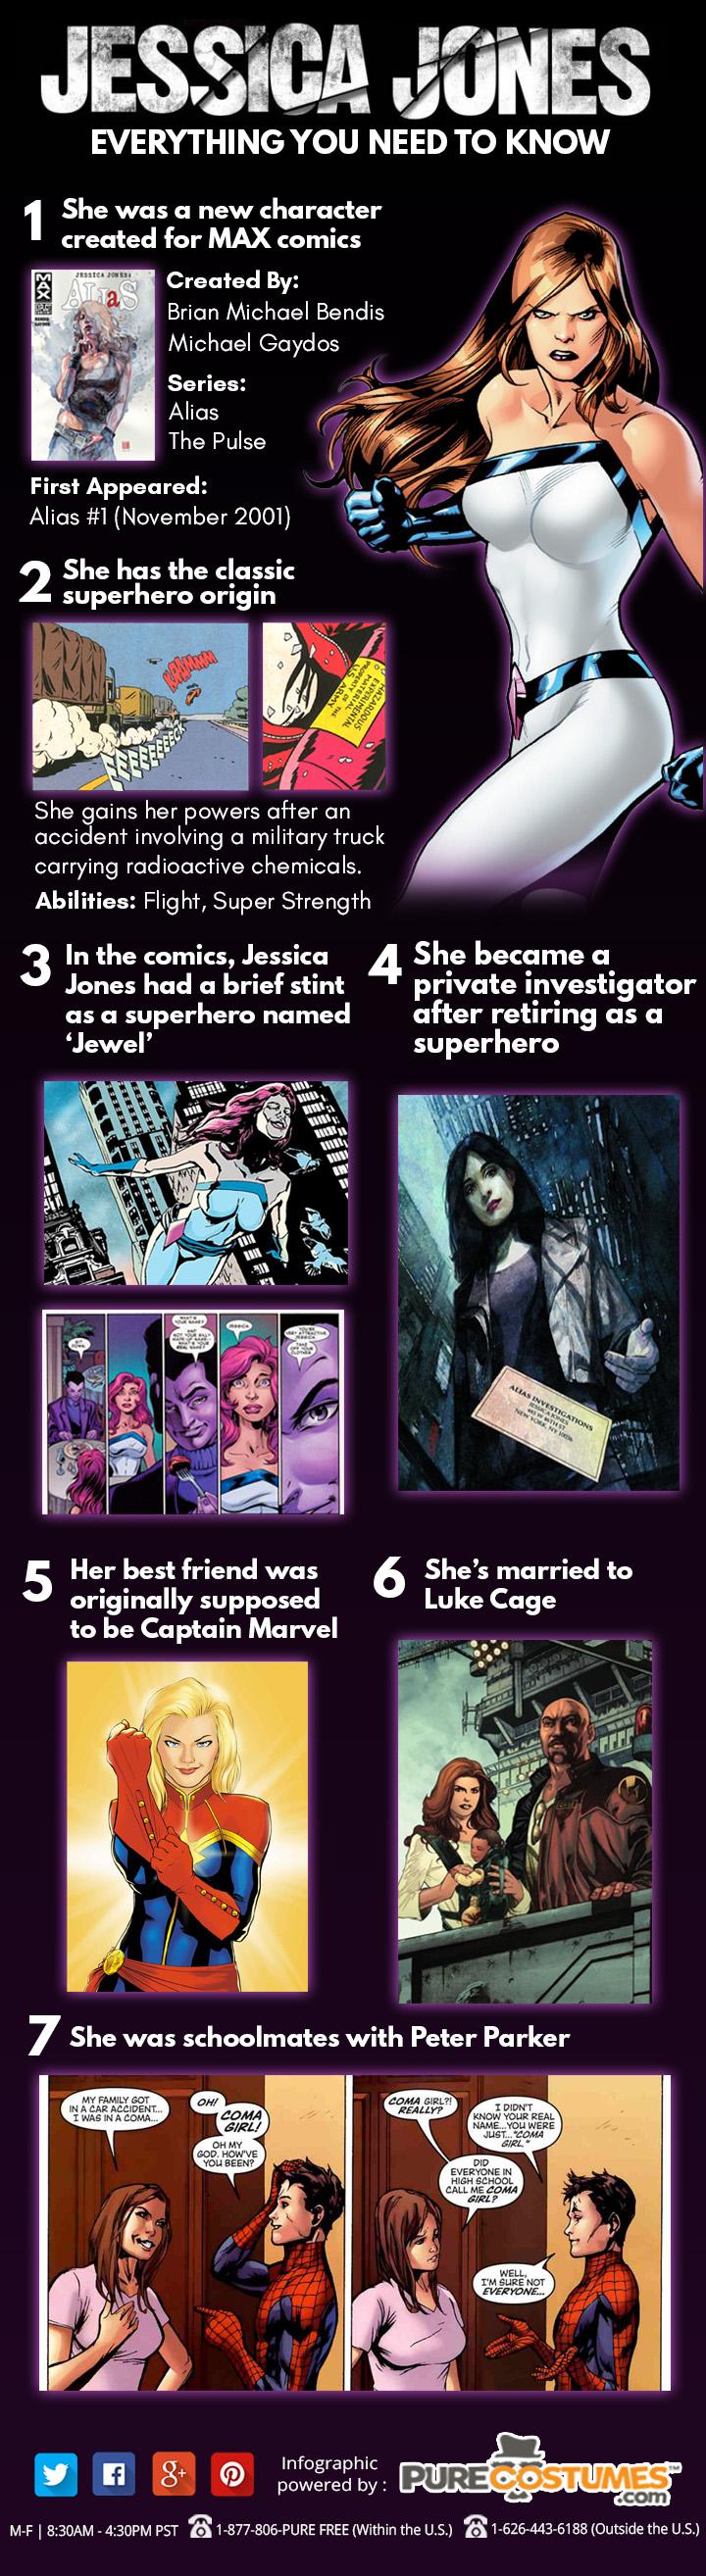 Jessica Jones Infographic